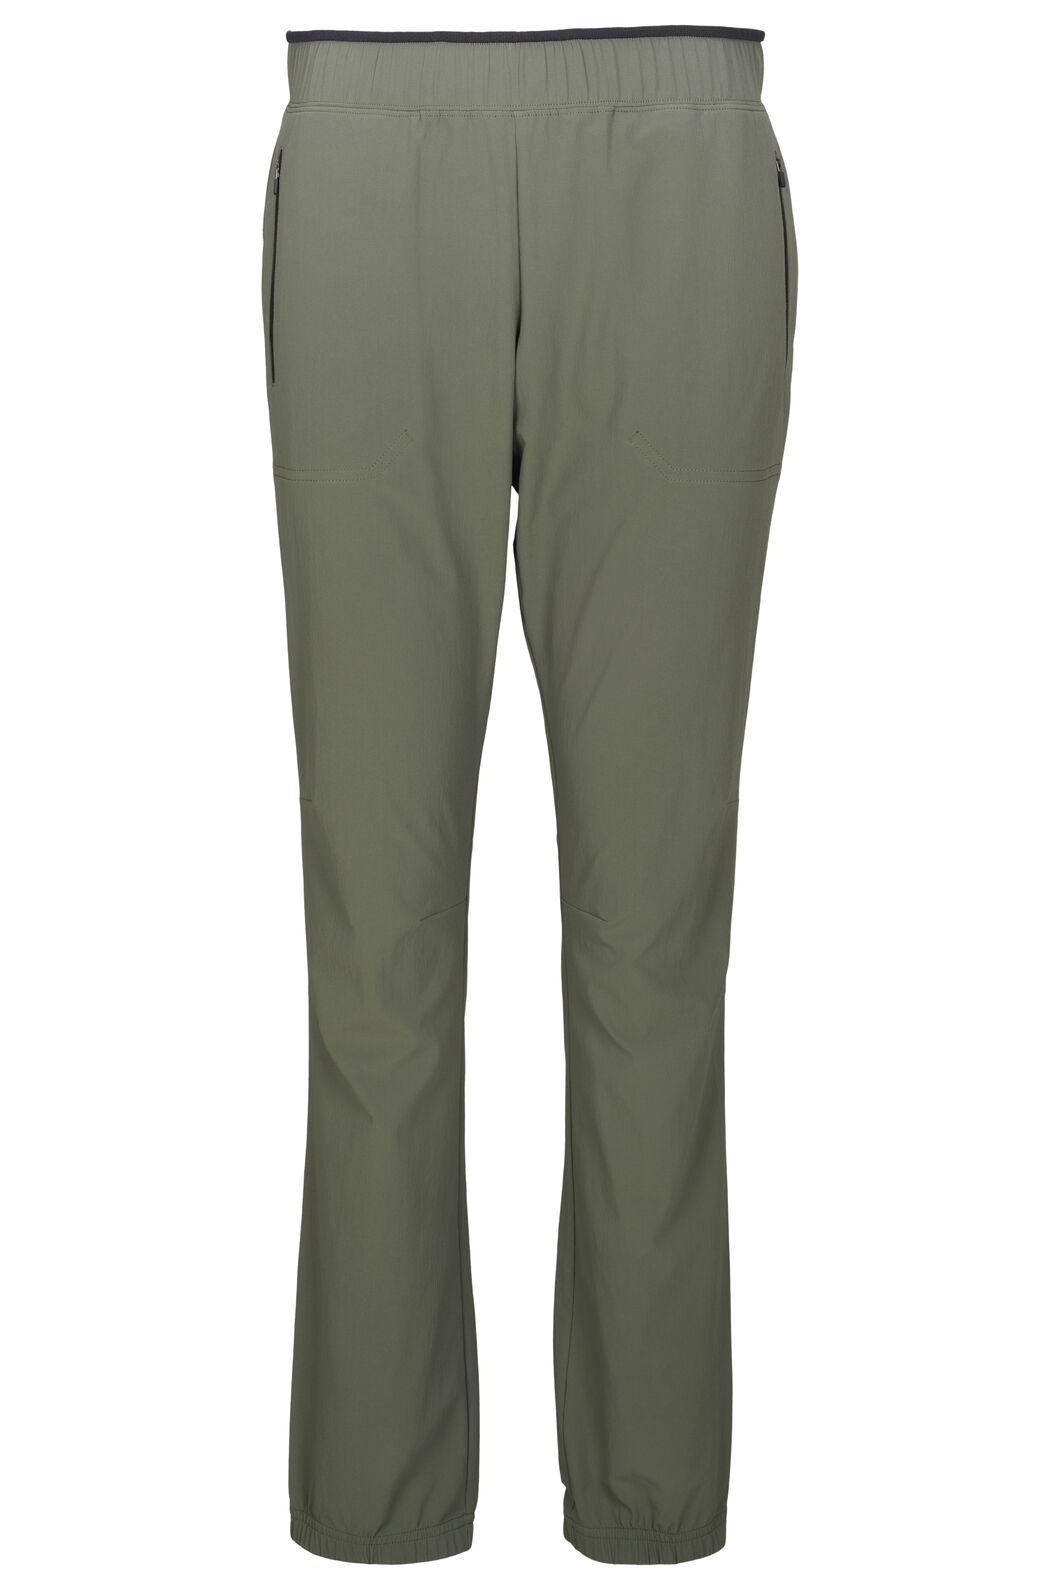 Macpac Hike Tight Pertex® Softshell Pants — Women's, Deep Lichen Green, hi-res